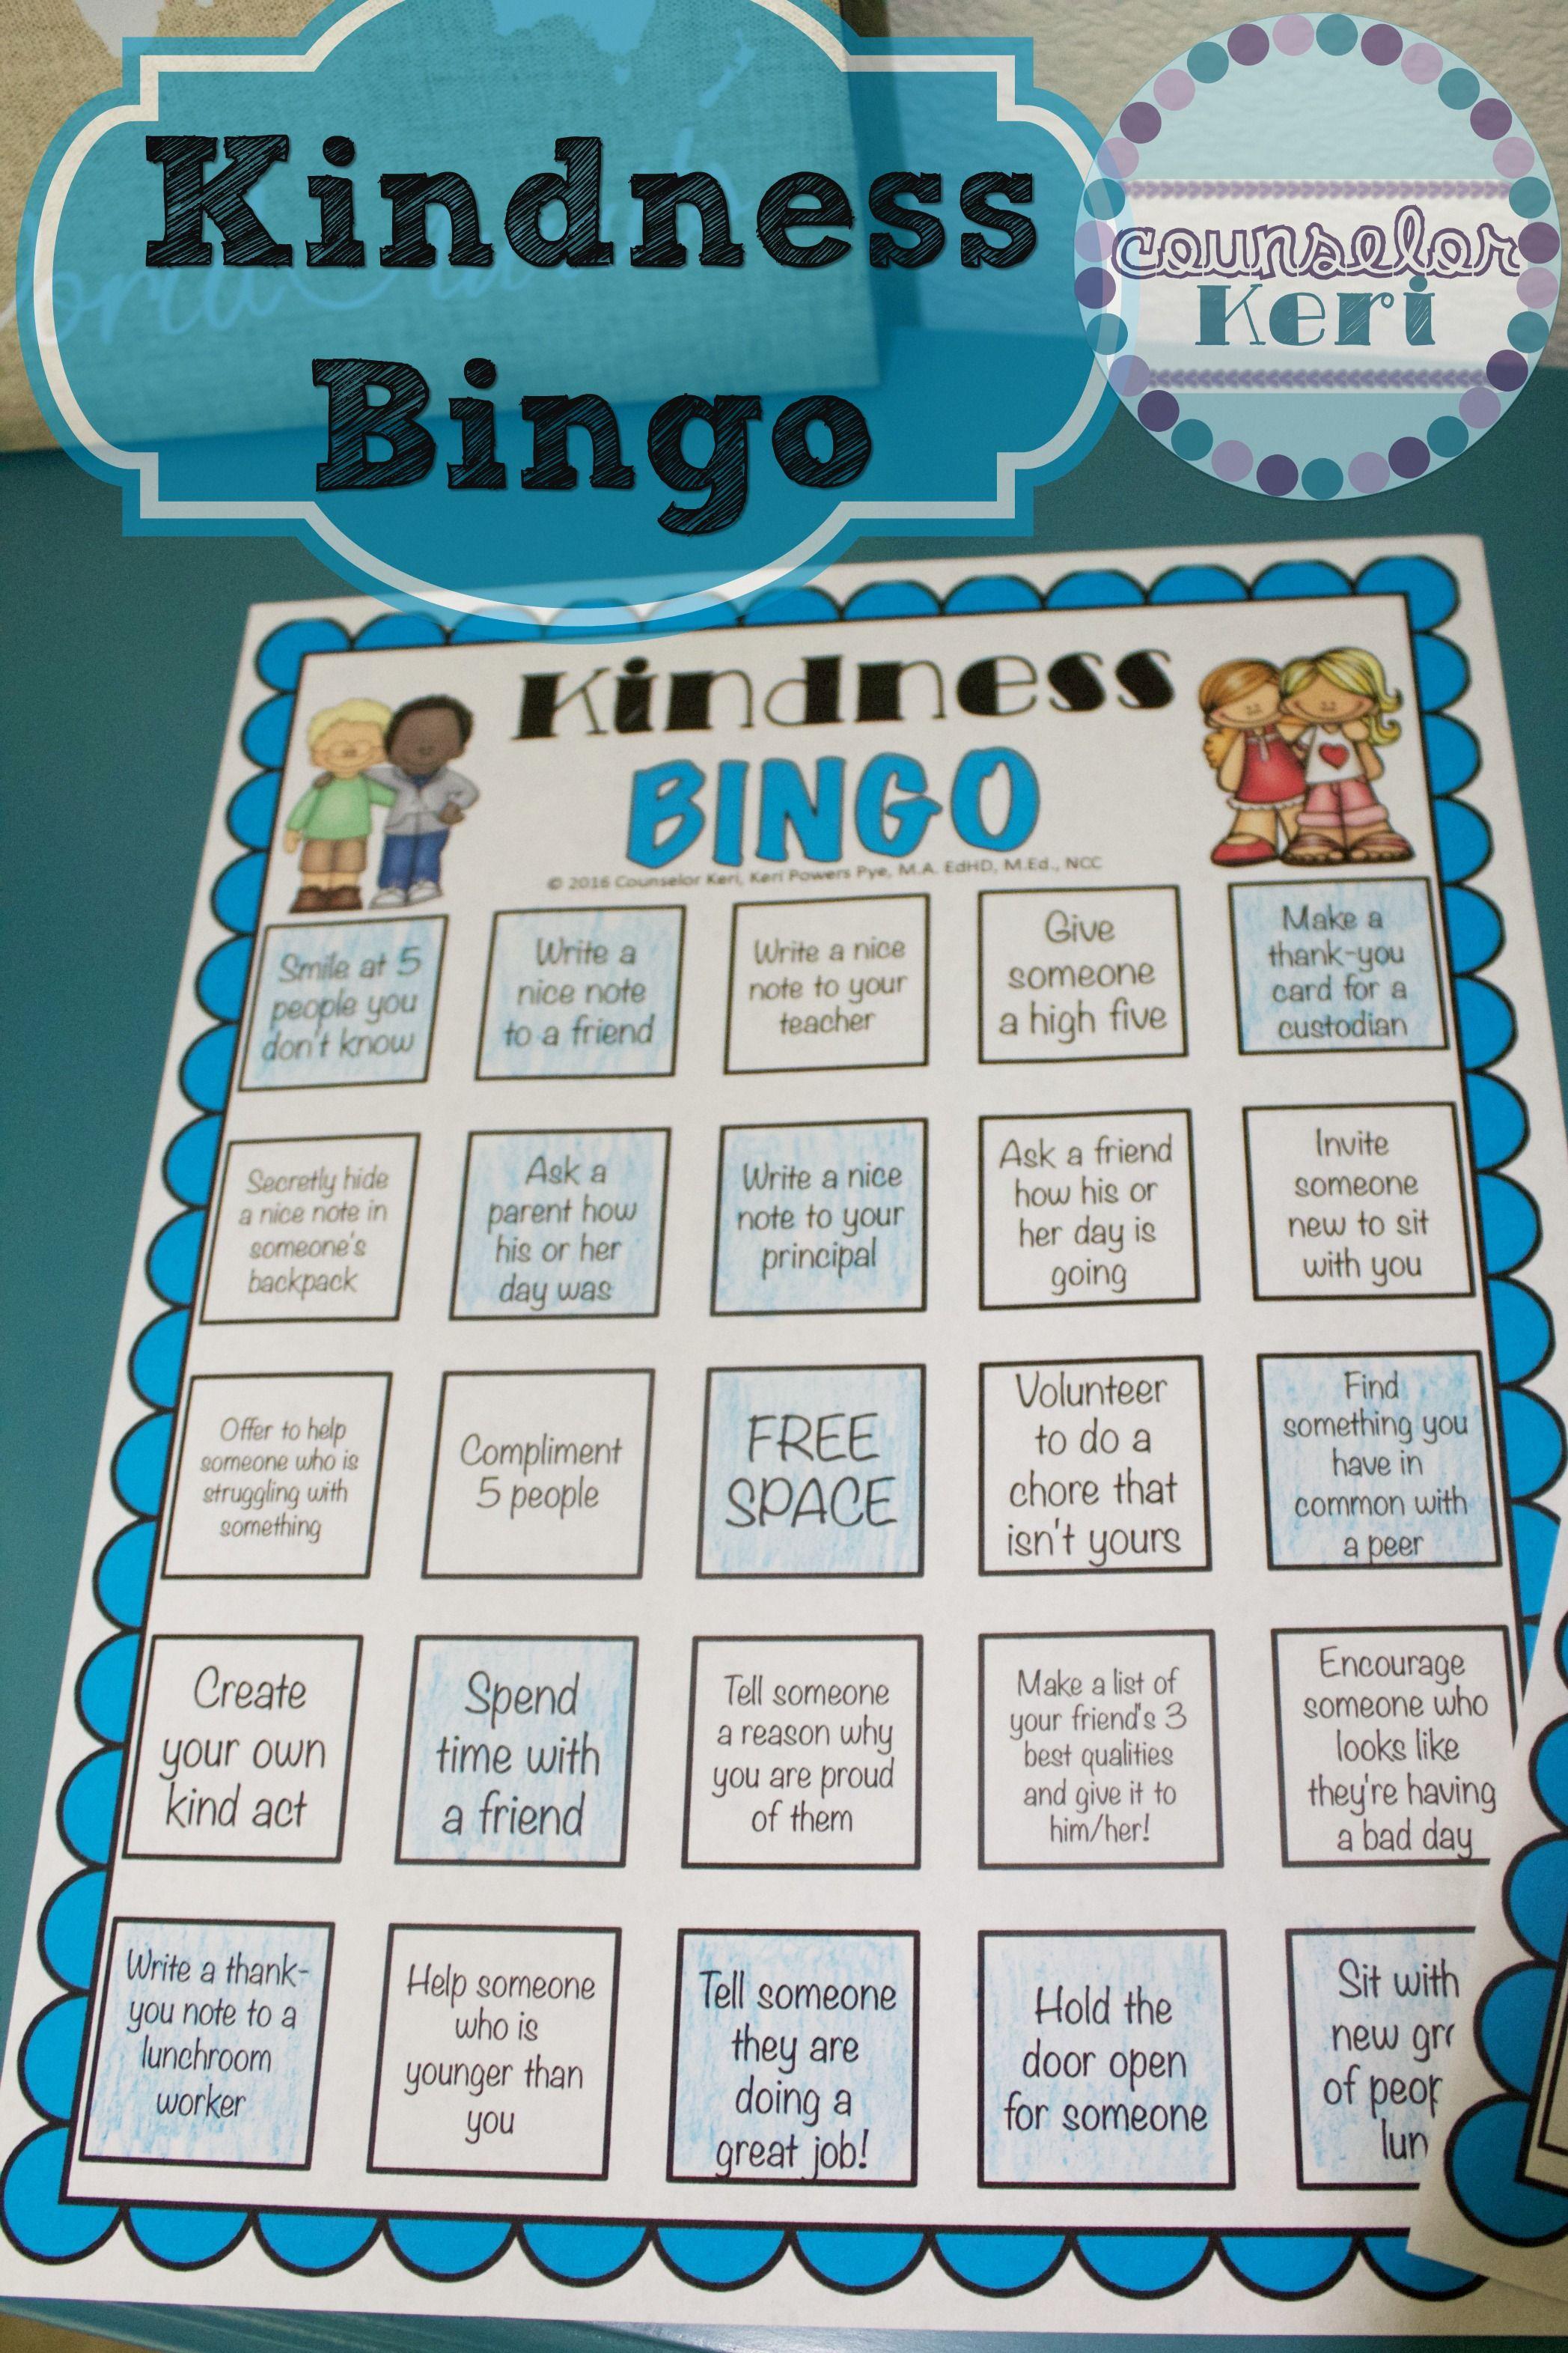 Free Kindness Bingo Printables From Counselor Keri